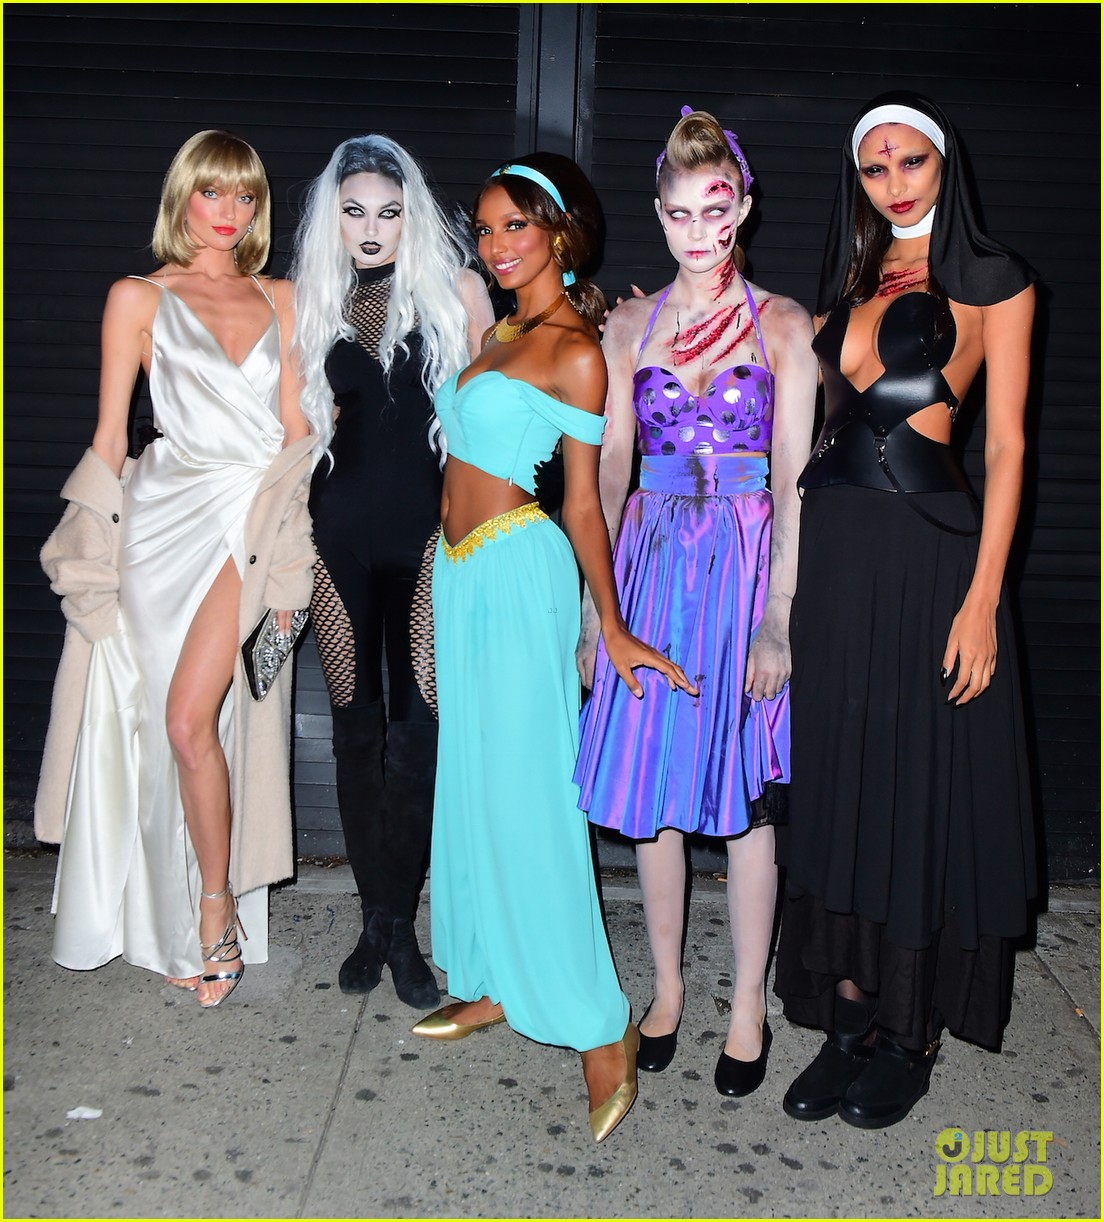 Victoria's Secret Angels Dress Up for Halloween Weekend 2016 ...